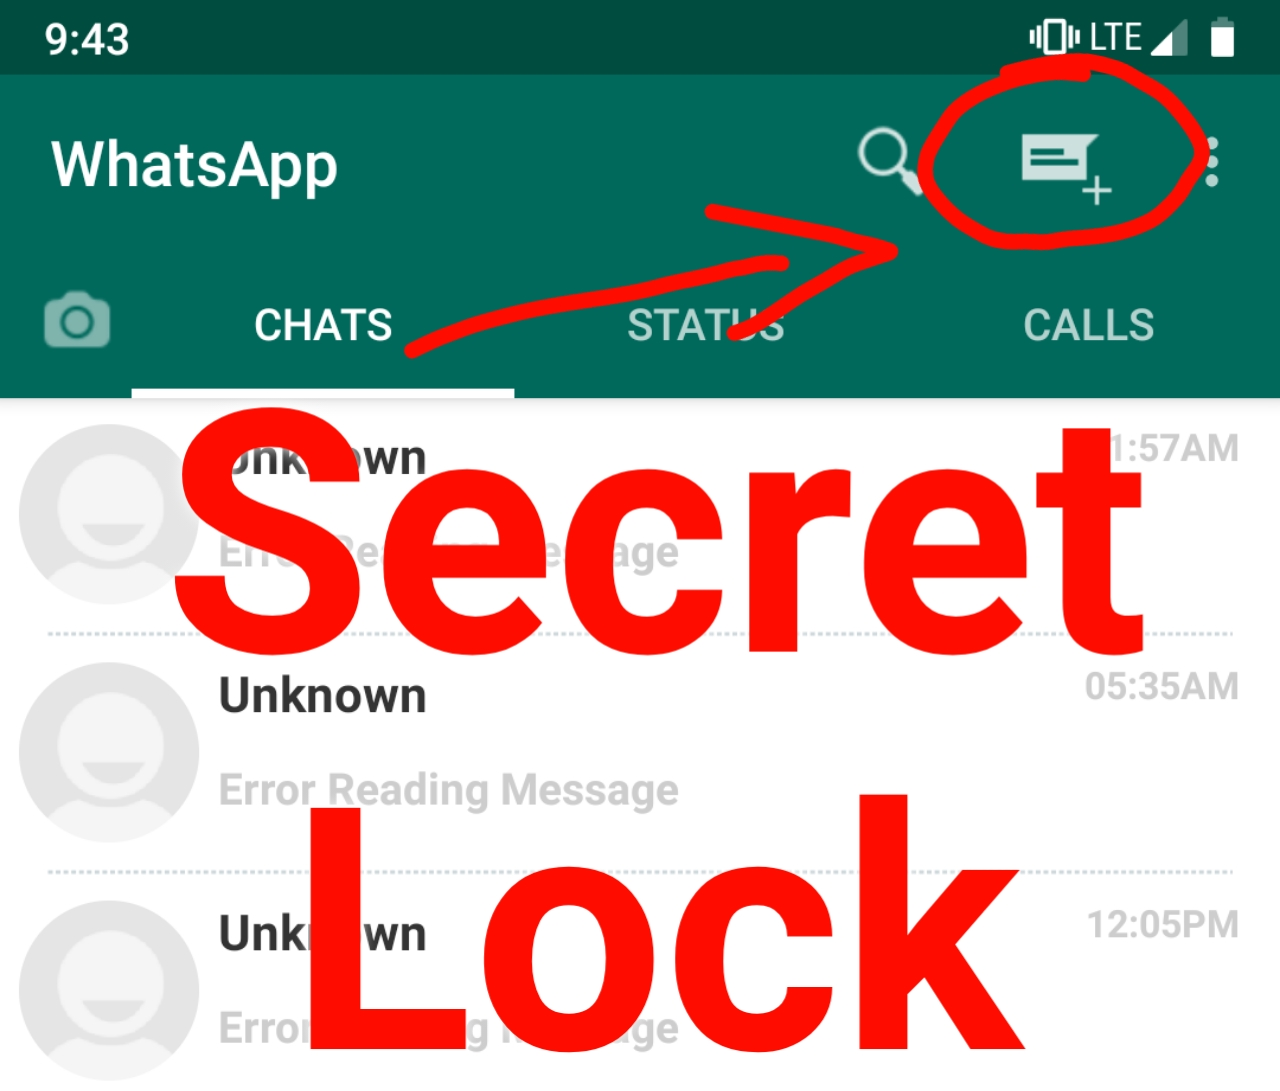 Fake WhatsApp : Whatsapp lock pro the secret whatsapp lock Application review News Kannadatech.com Kannadatech.com, Whatsapp hidden lock, WhatsApp lock, WhatsApp lock pro APK free download, WhatsApp lock pro application, WhatsApp lock pro application free download, WhatsApp new tricks  Kannada Tech